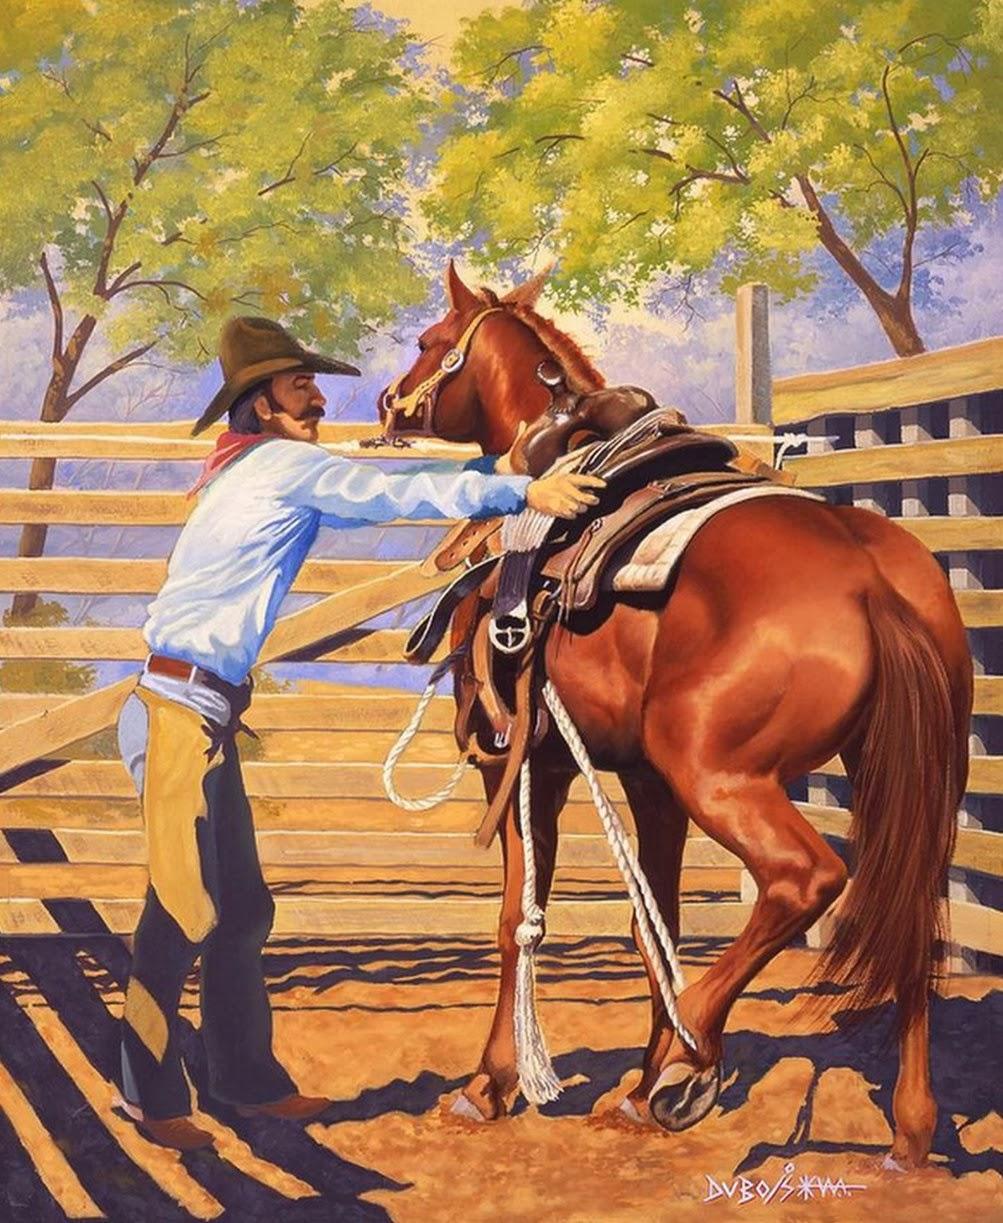 Montando un toro salvaje - 5 2